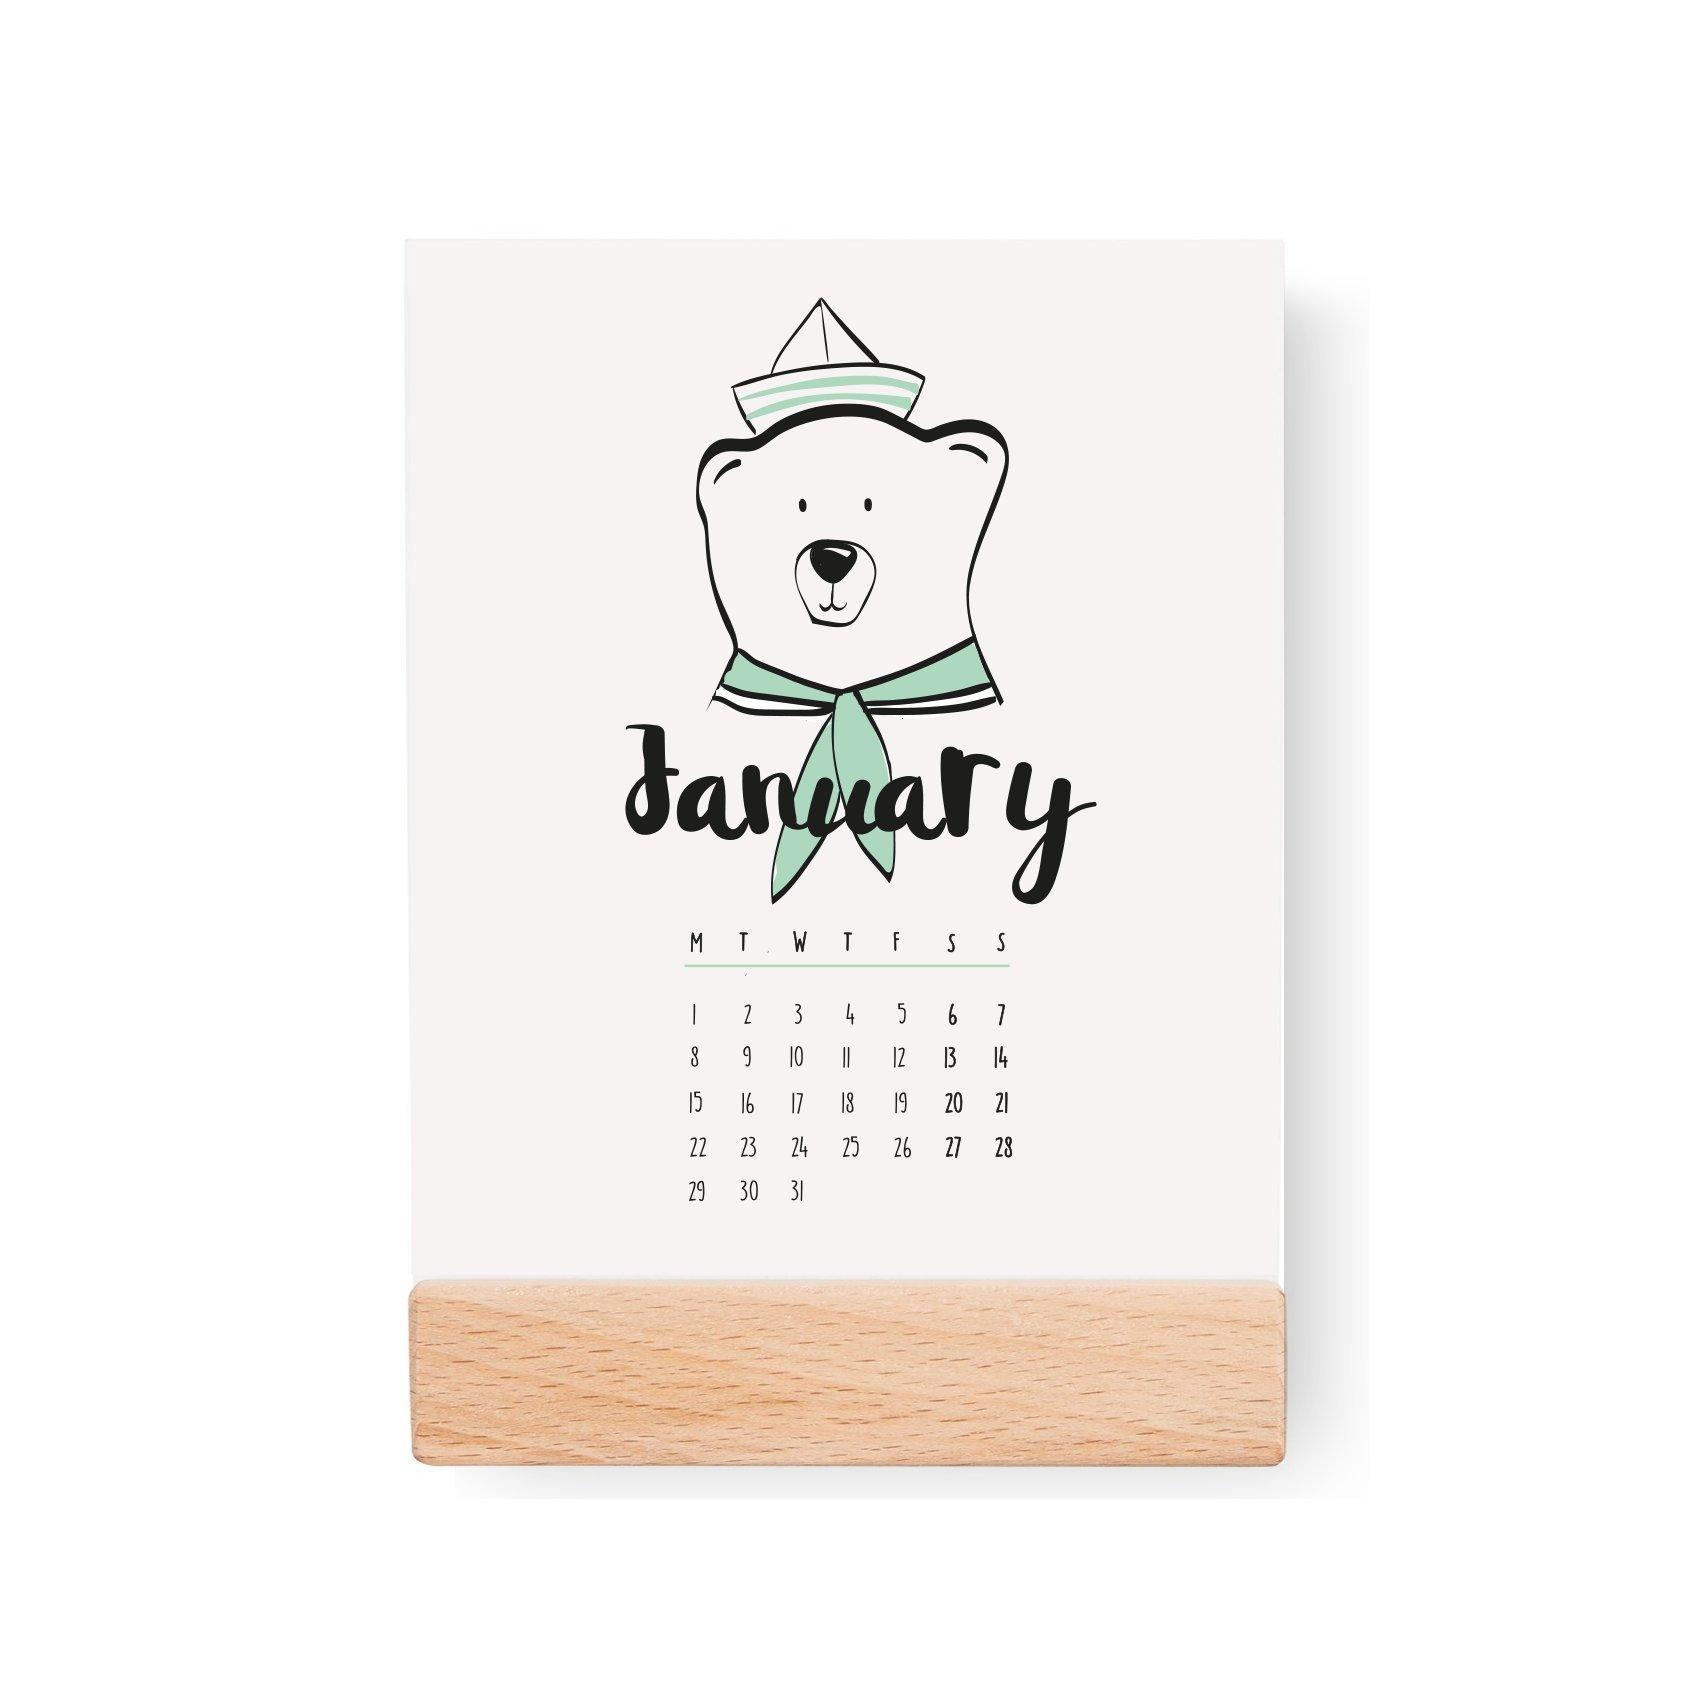 2018 Desktop Kids Calendar, Nursery Calendar, 2018 Calendar, Colorful Calendar, Card Stock Paper, Modern Calendar, Christmas Gift Idea